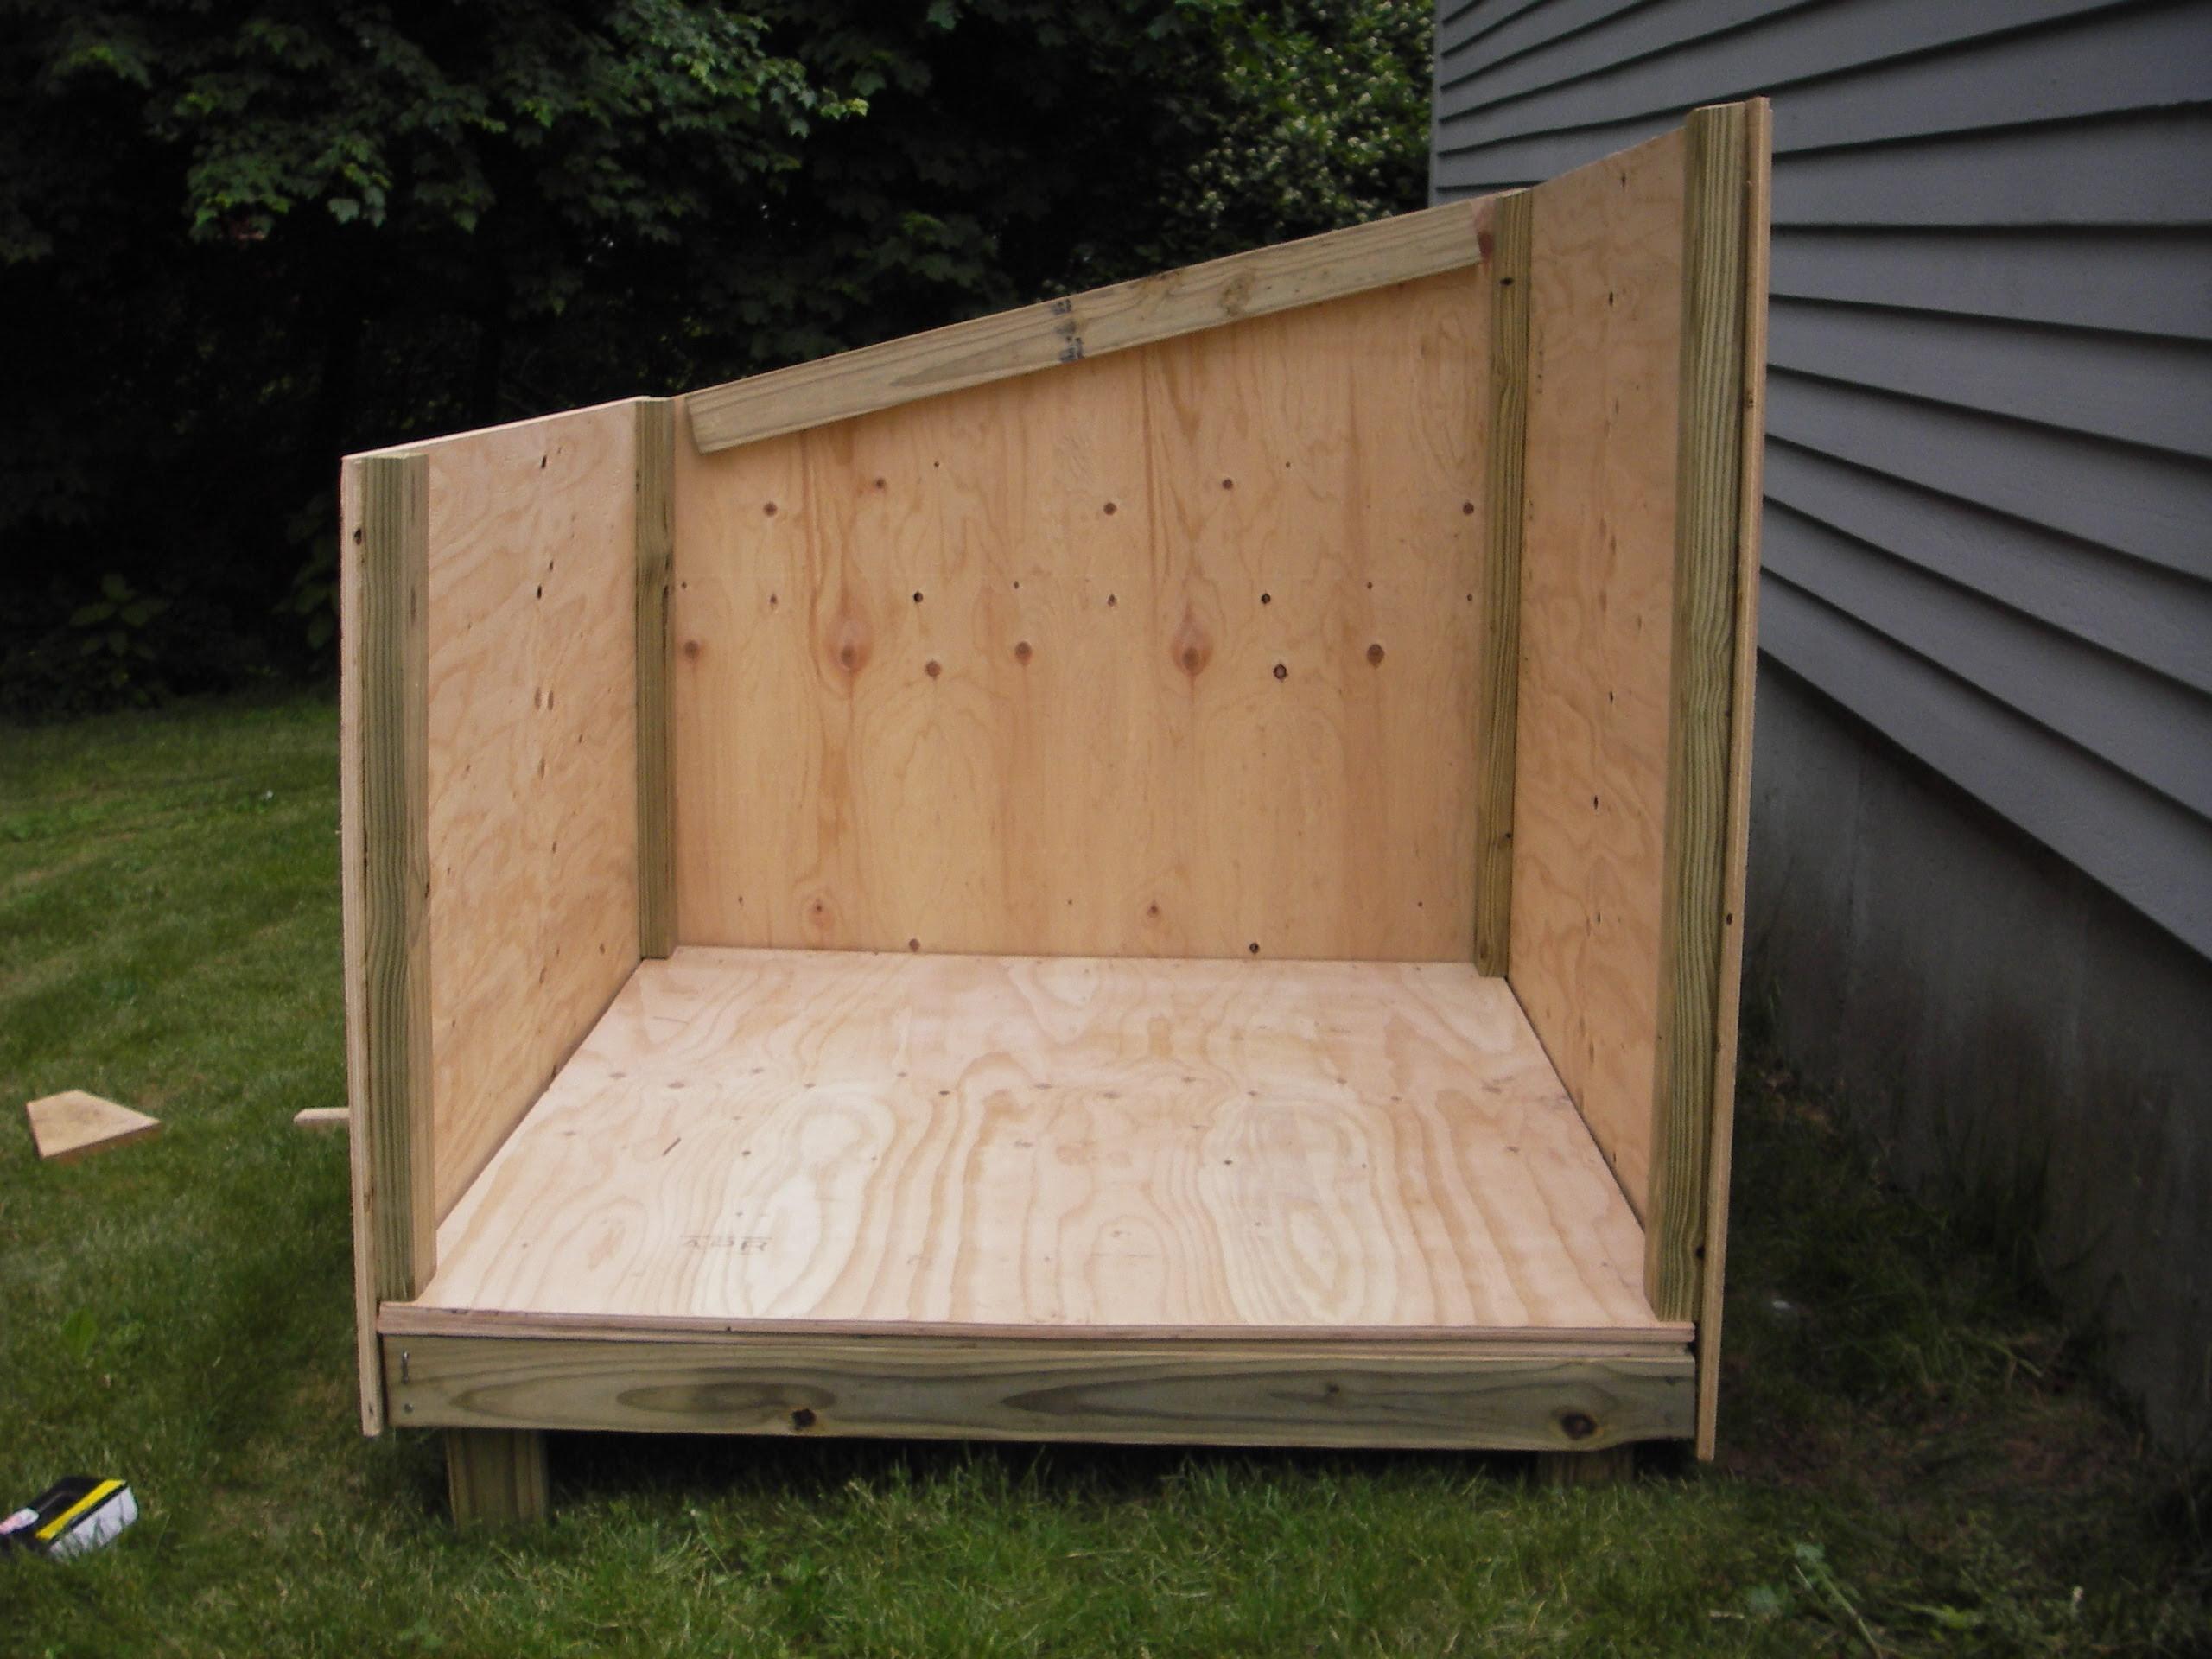 Shed Roof Dog House Plans Portable Garden Shed - Dog-house-frame